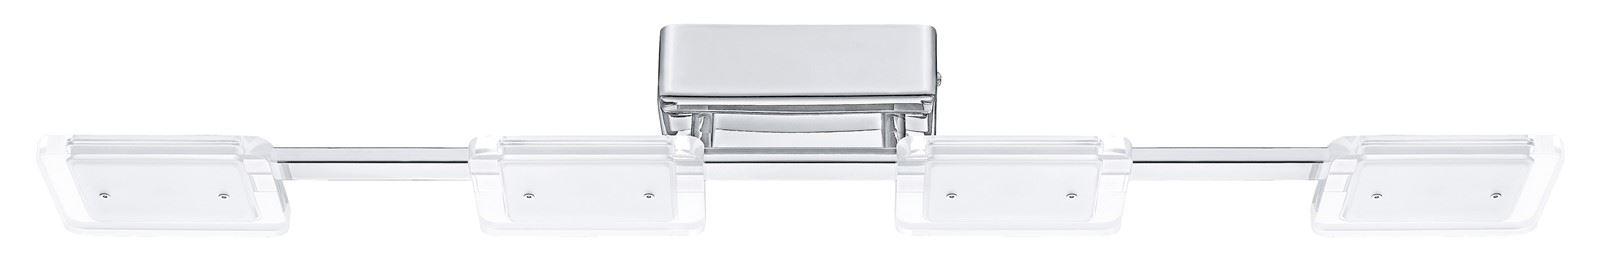 Cartama LED Ceiling Light 4x4.5W Steel Chrome Clear Satin Finish